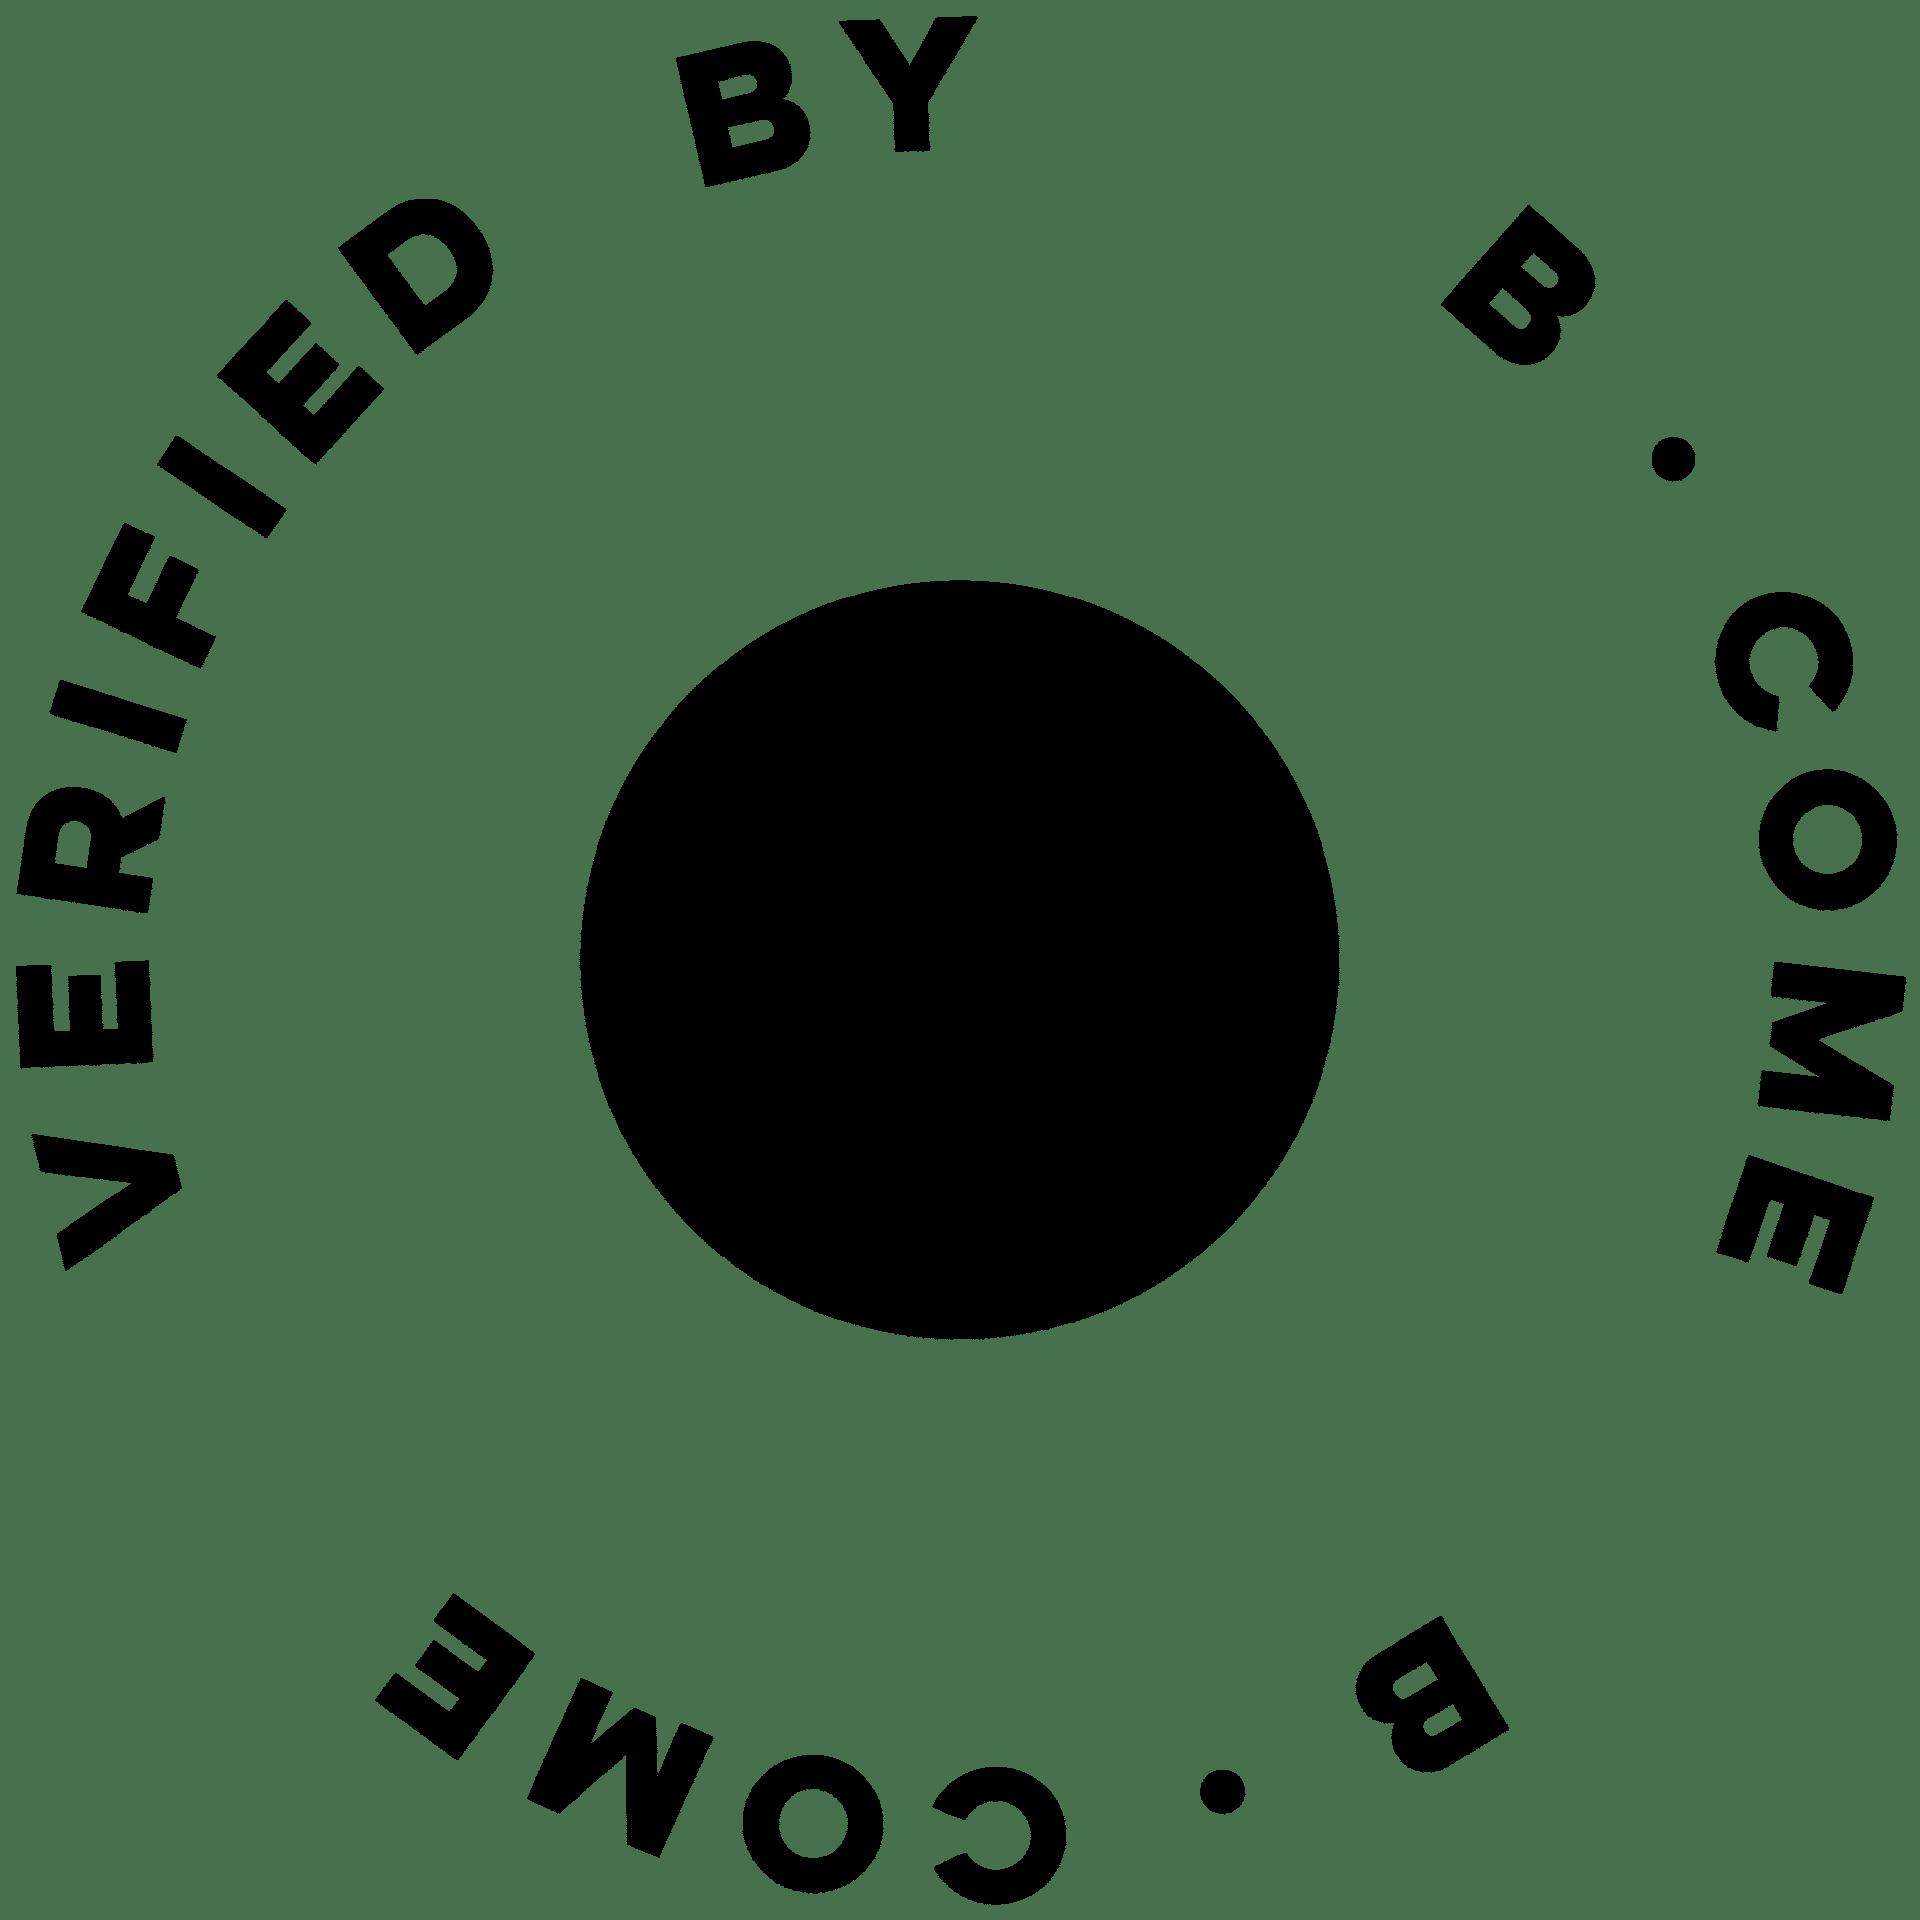 logotipo-certificado-bcome-con